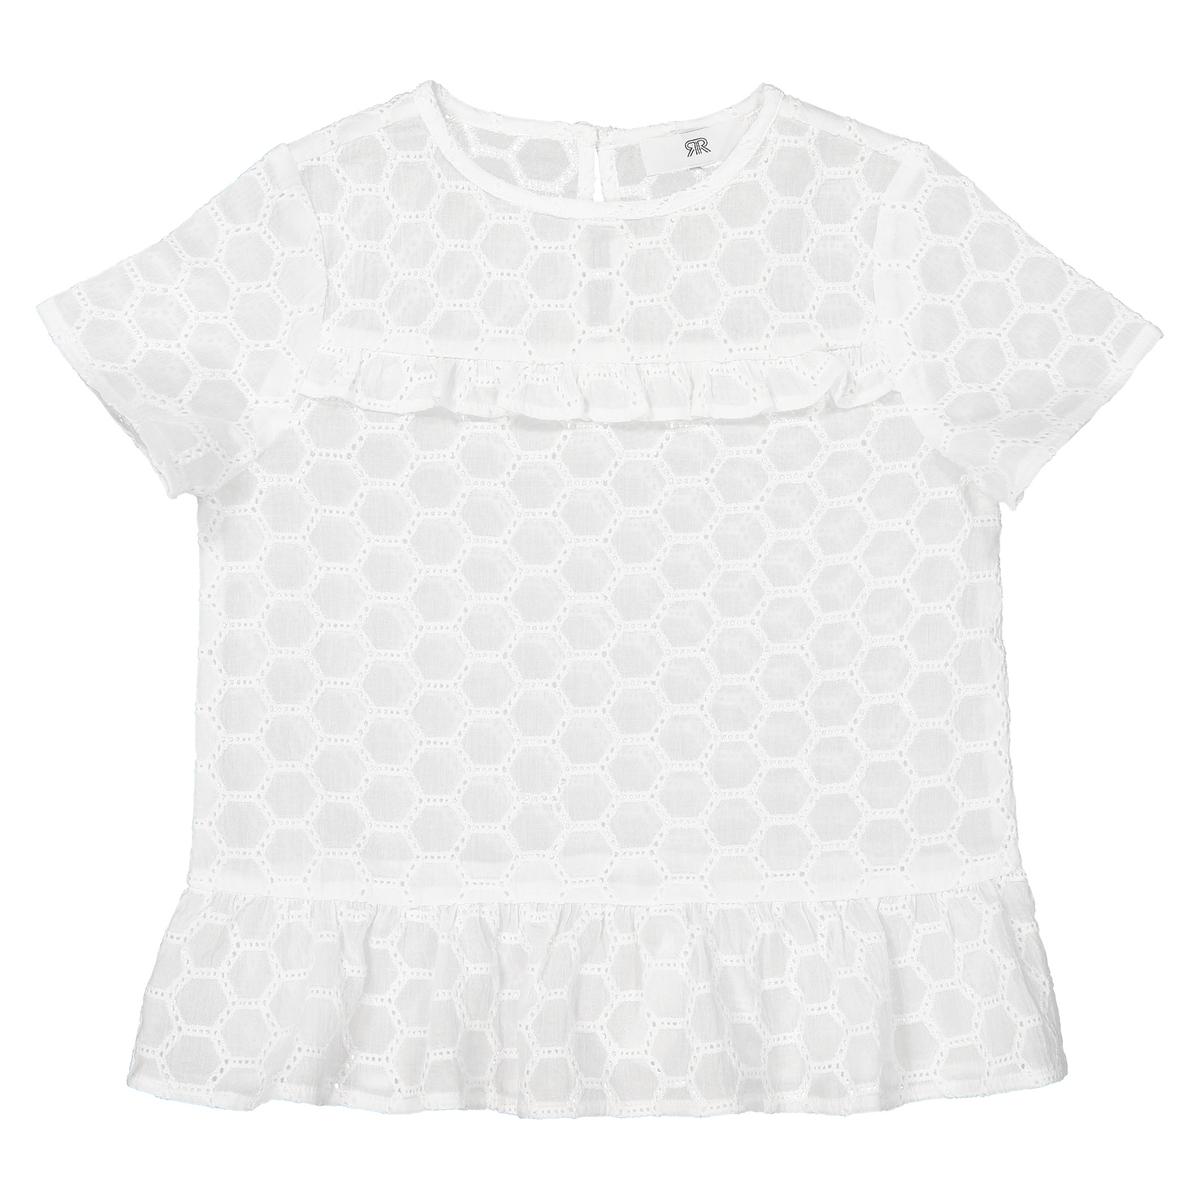 Blusa bordada, 3-12 anos